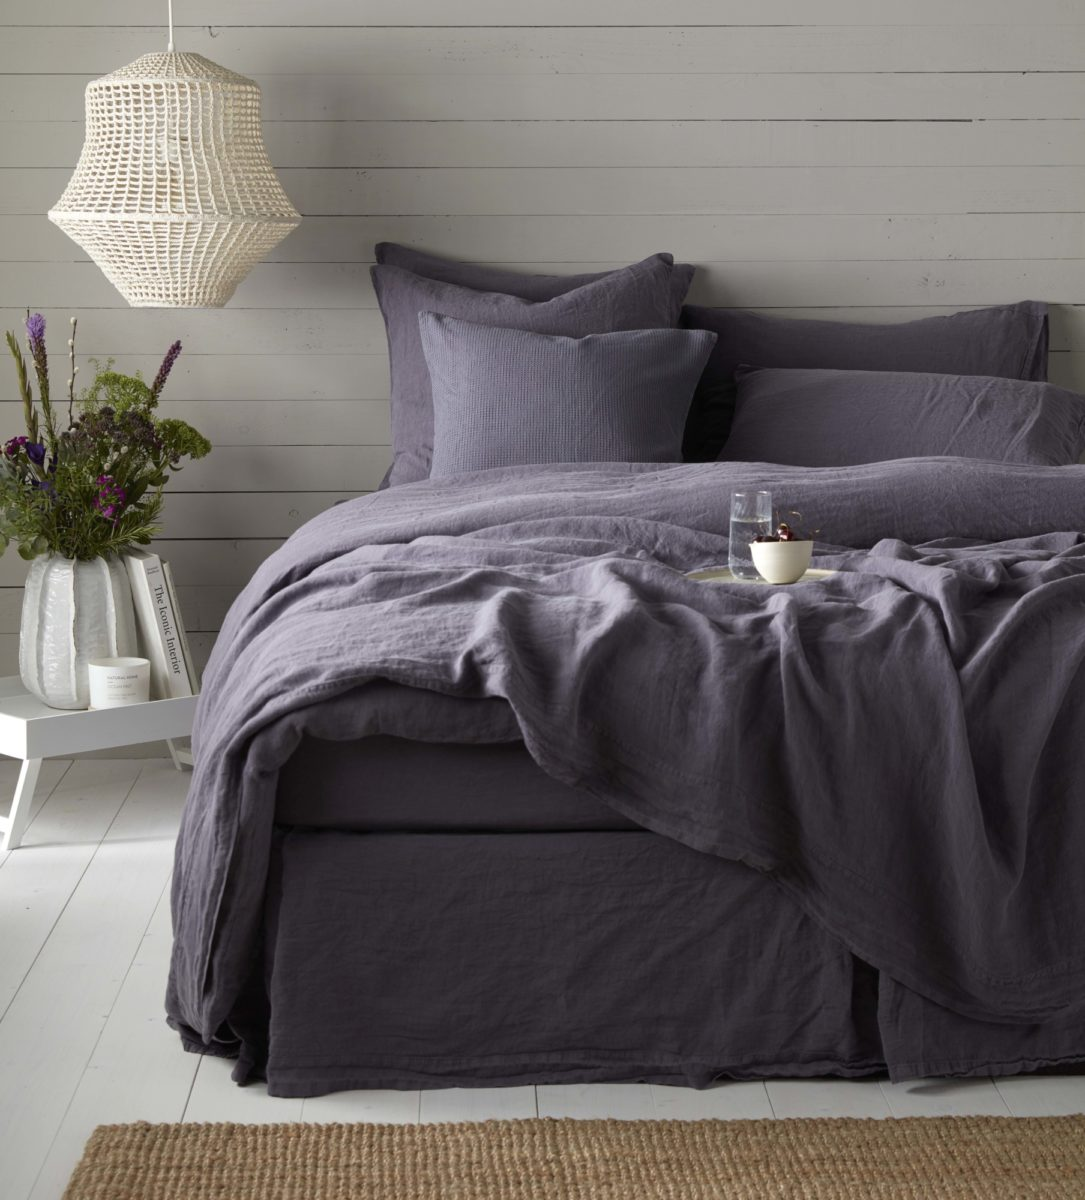 aubergine bed linen